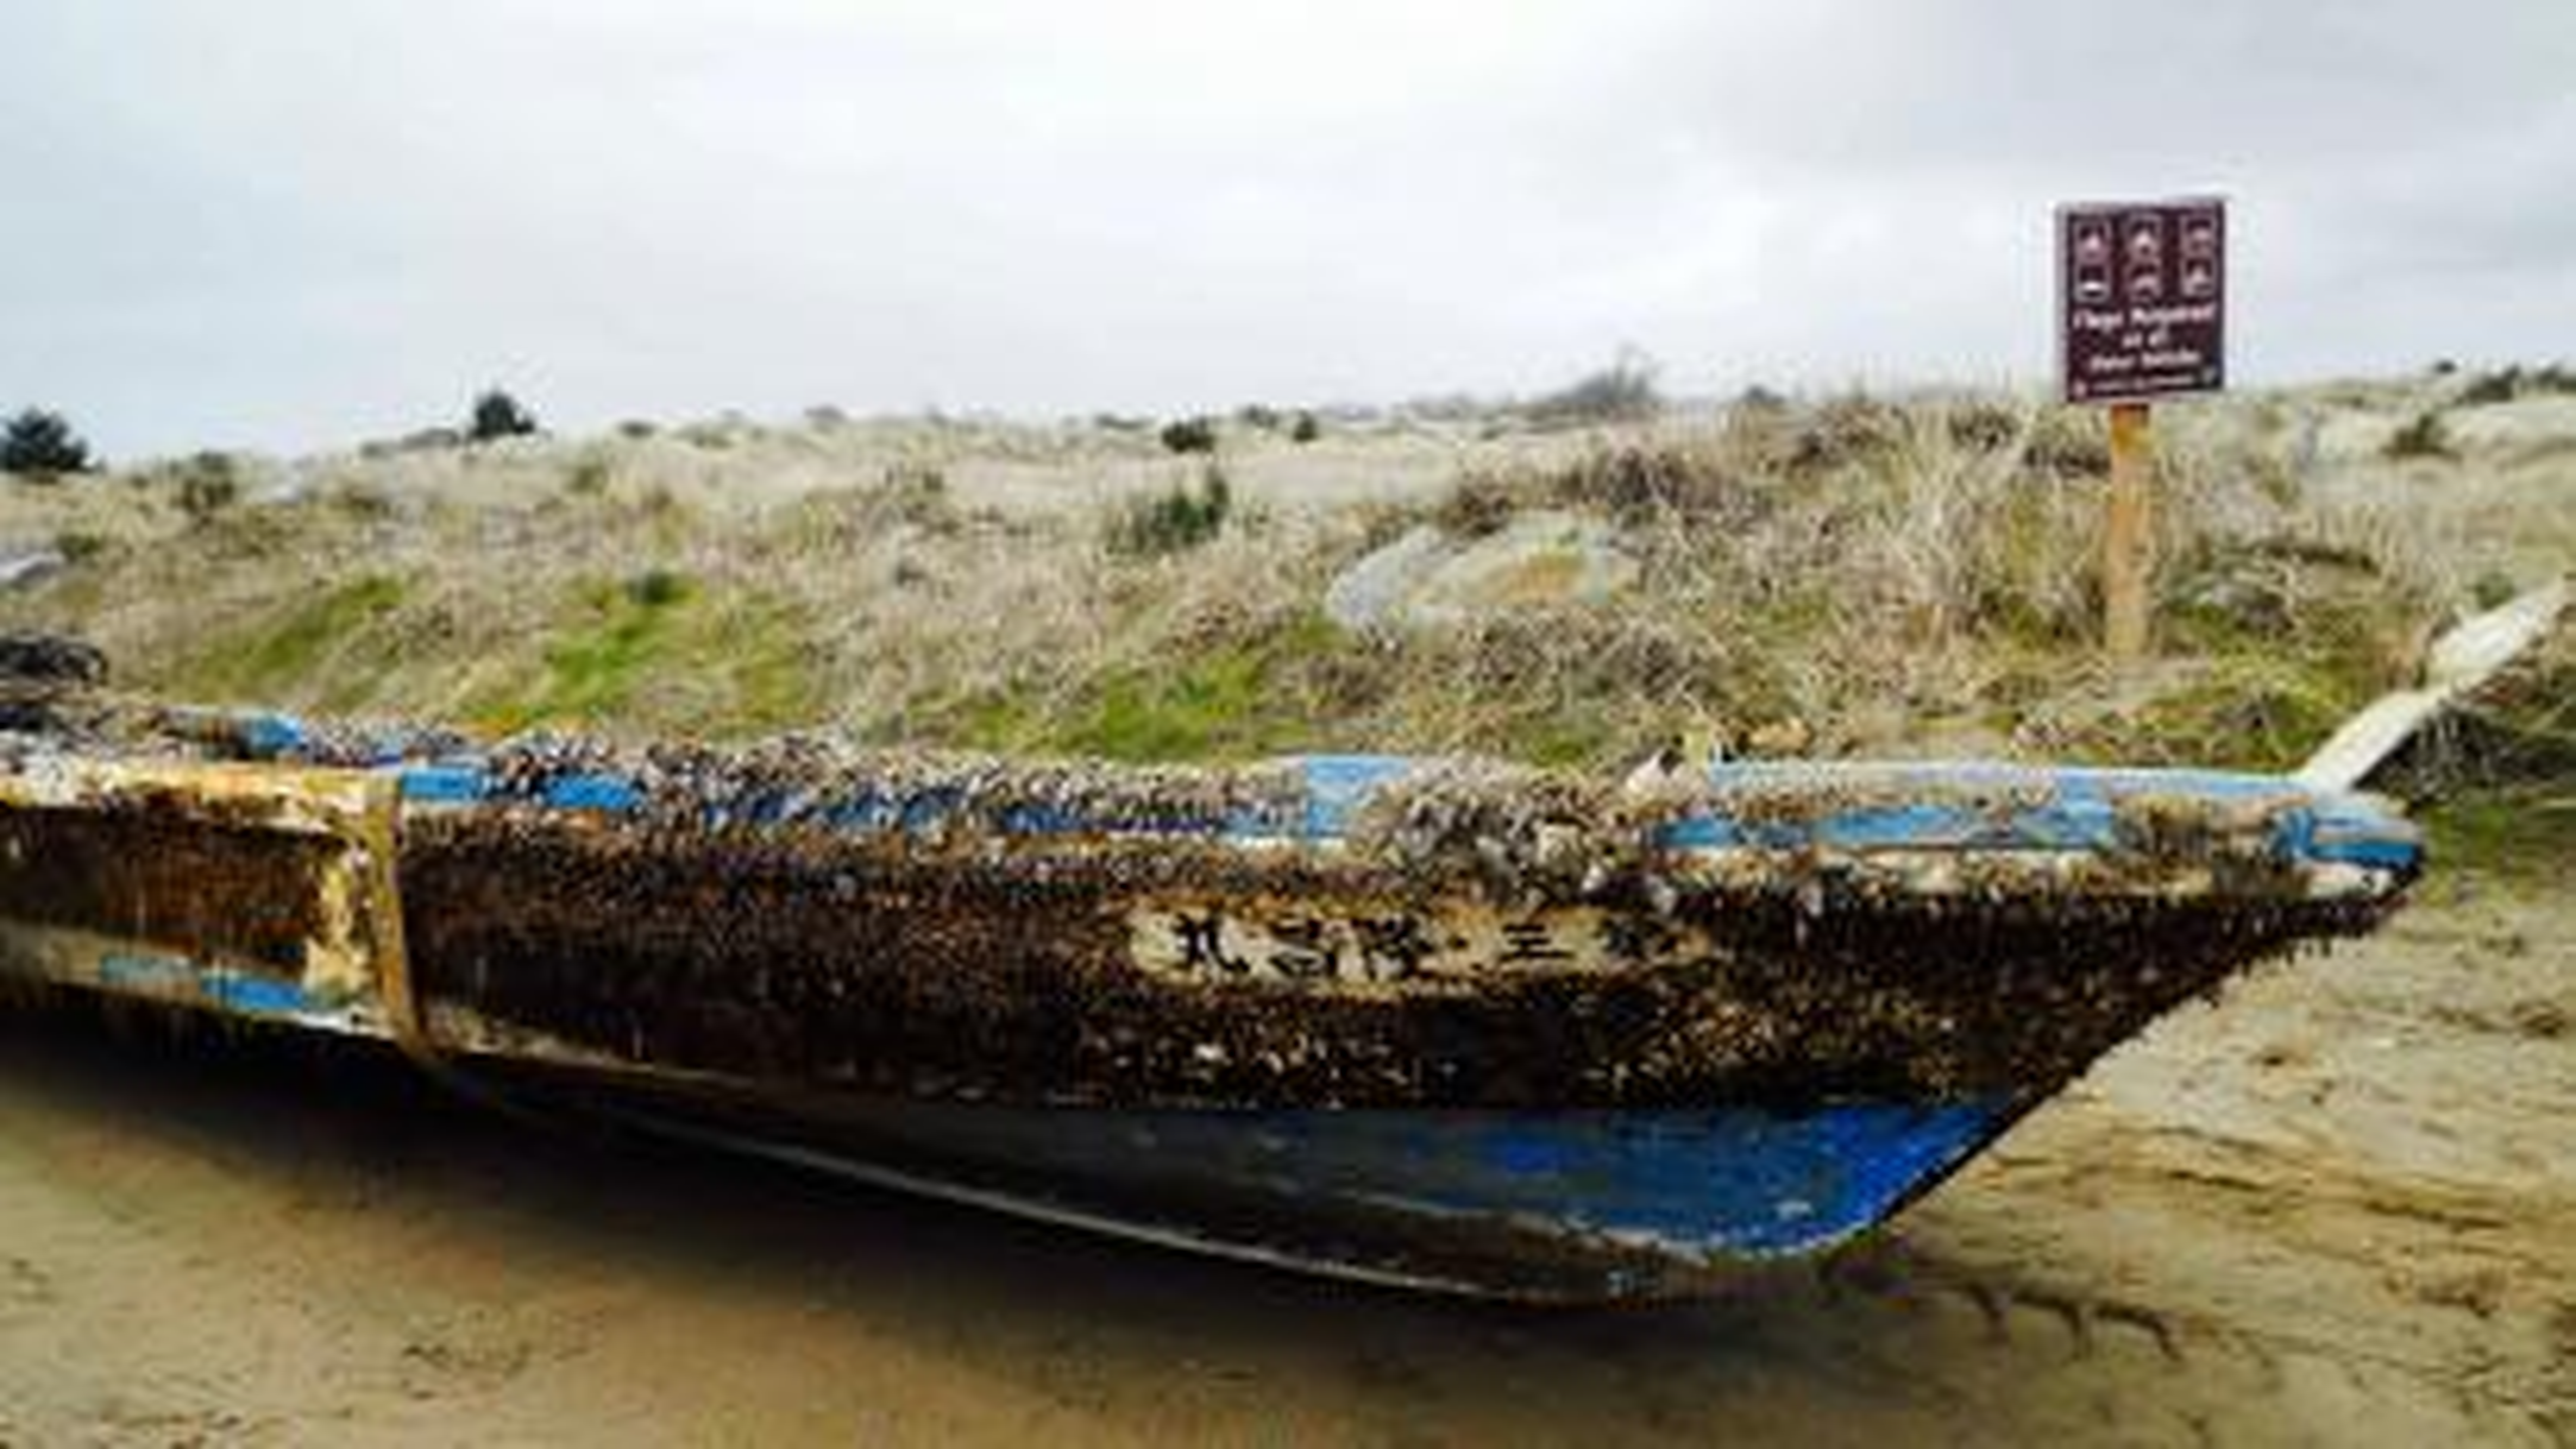 Barnacle boat.